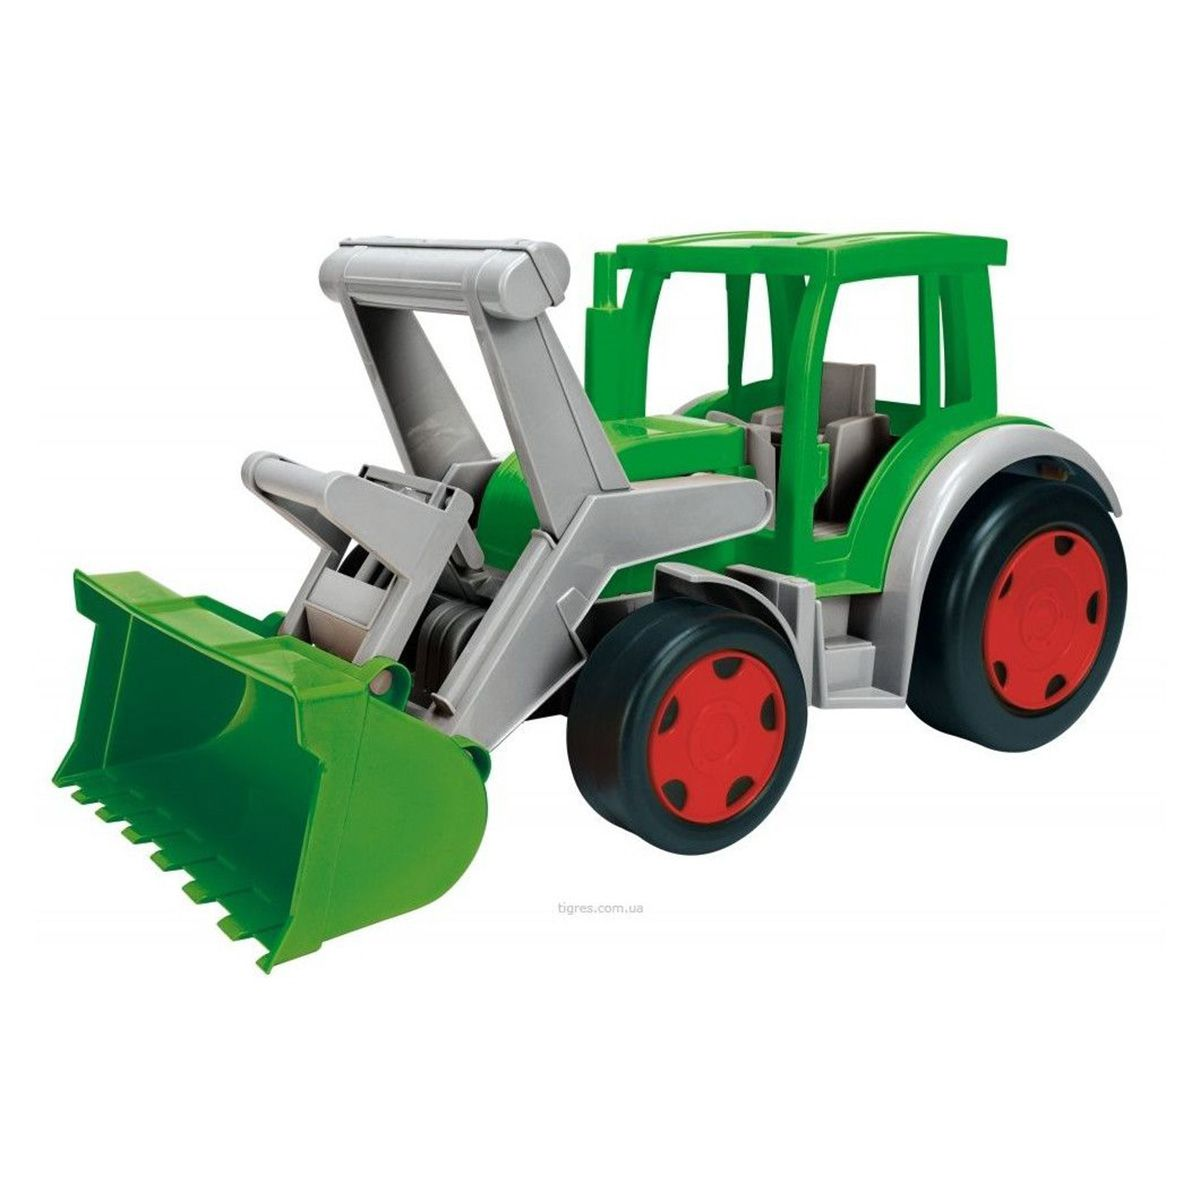 "Трактор ""Гигант"" - Фермер"